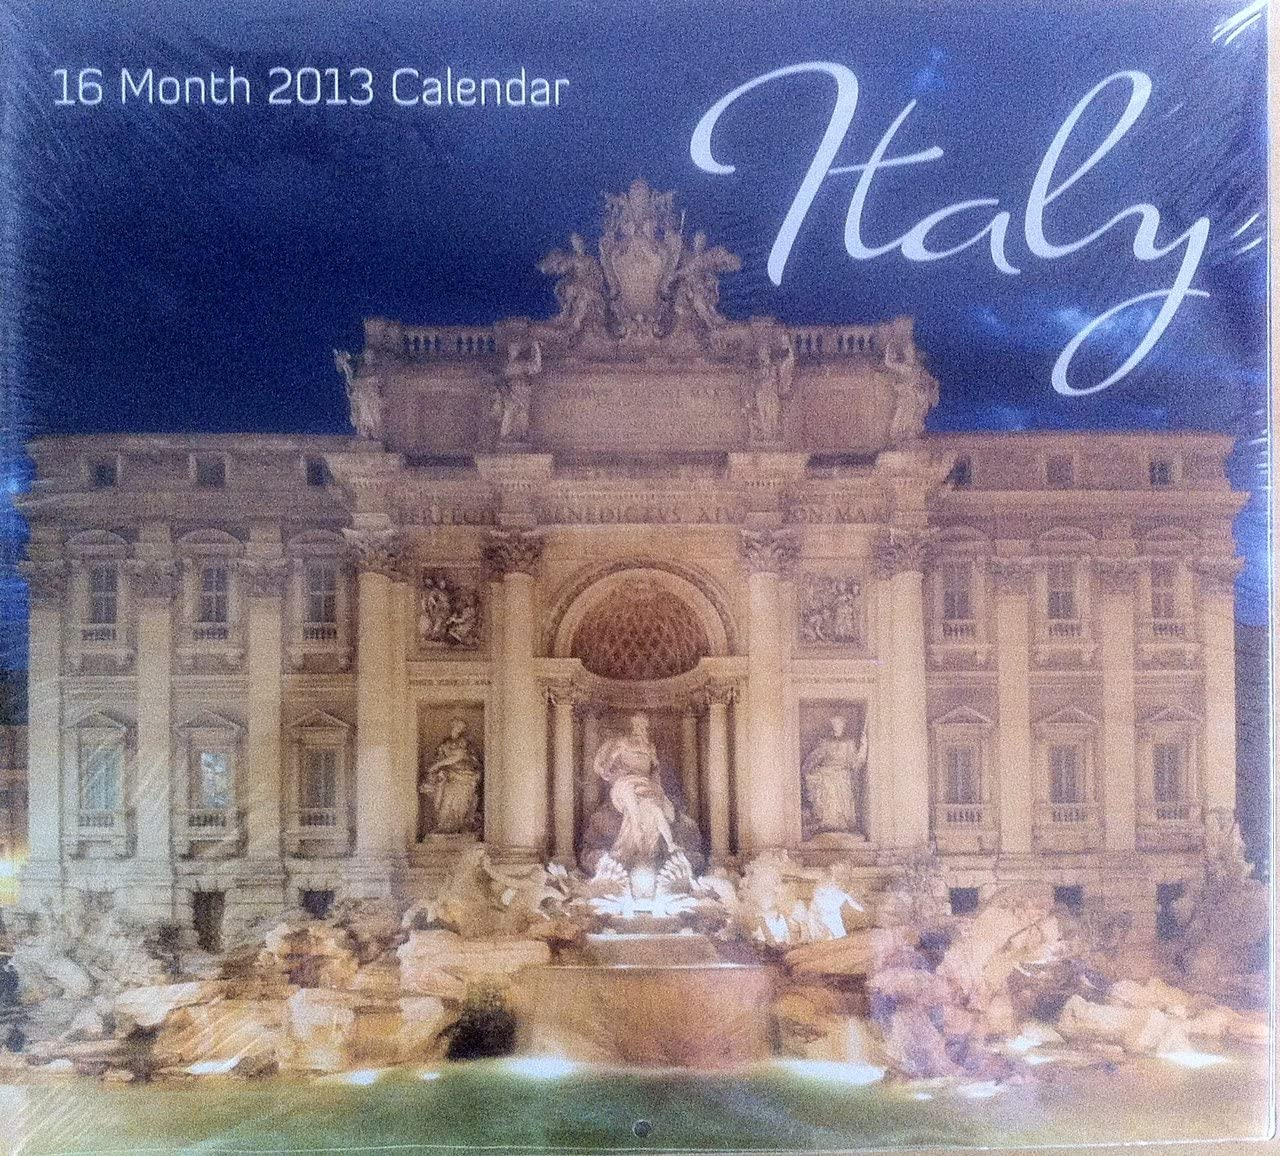 Italy Calendar Philadelphia Mall 1 year warranty